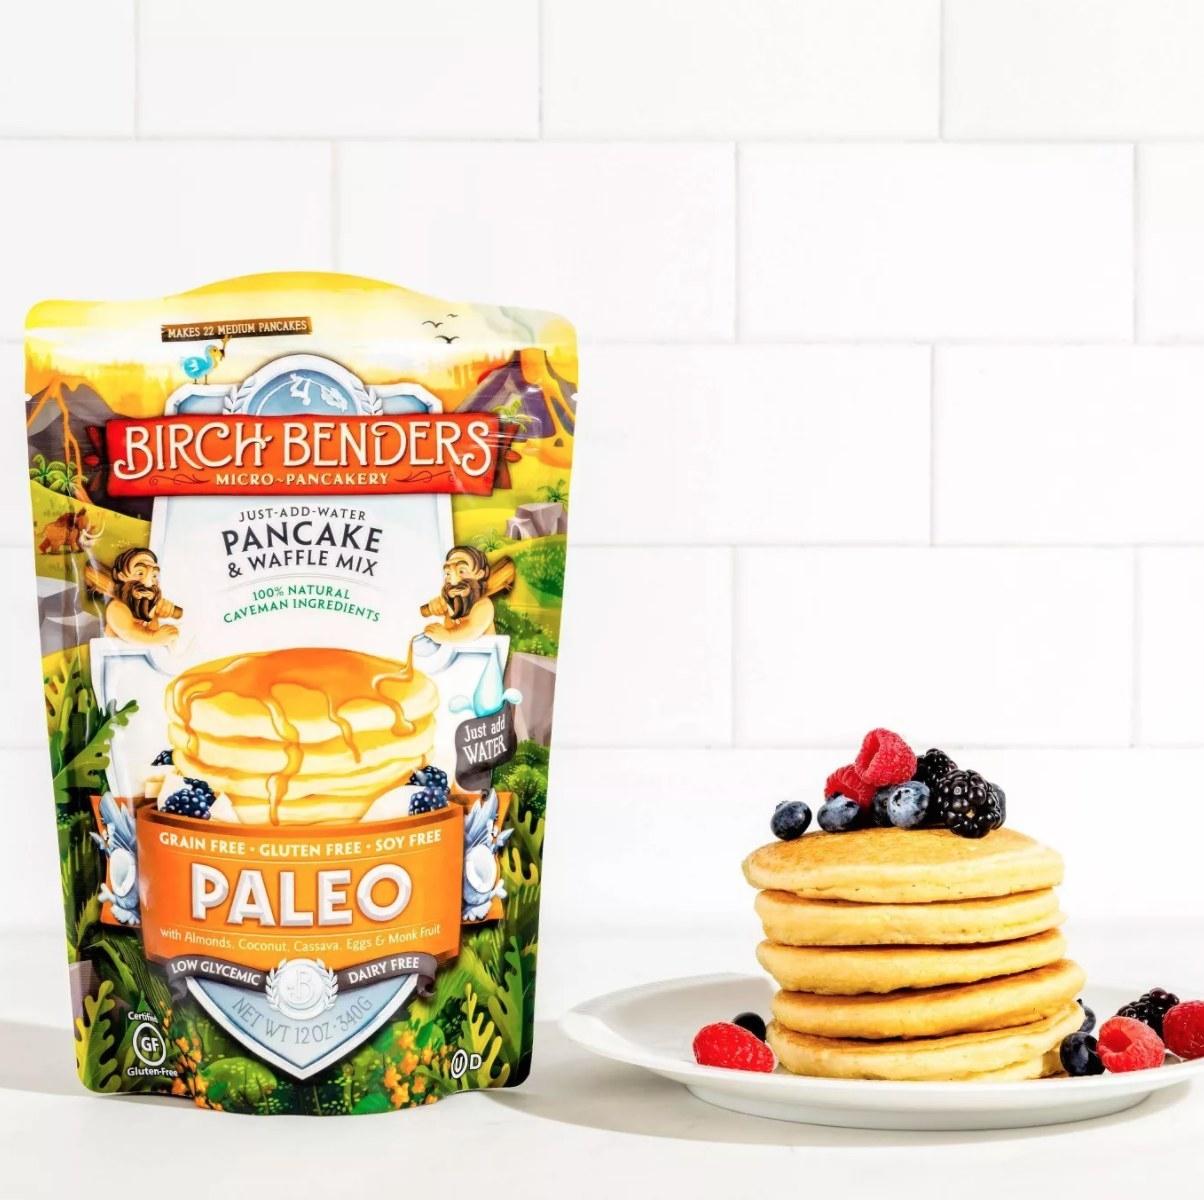 The pancake mix